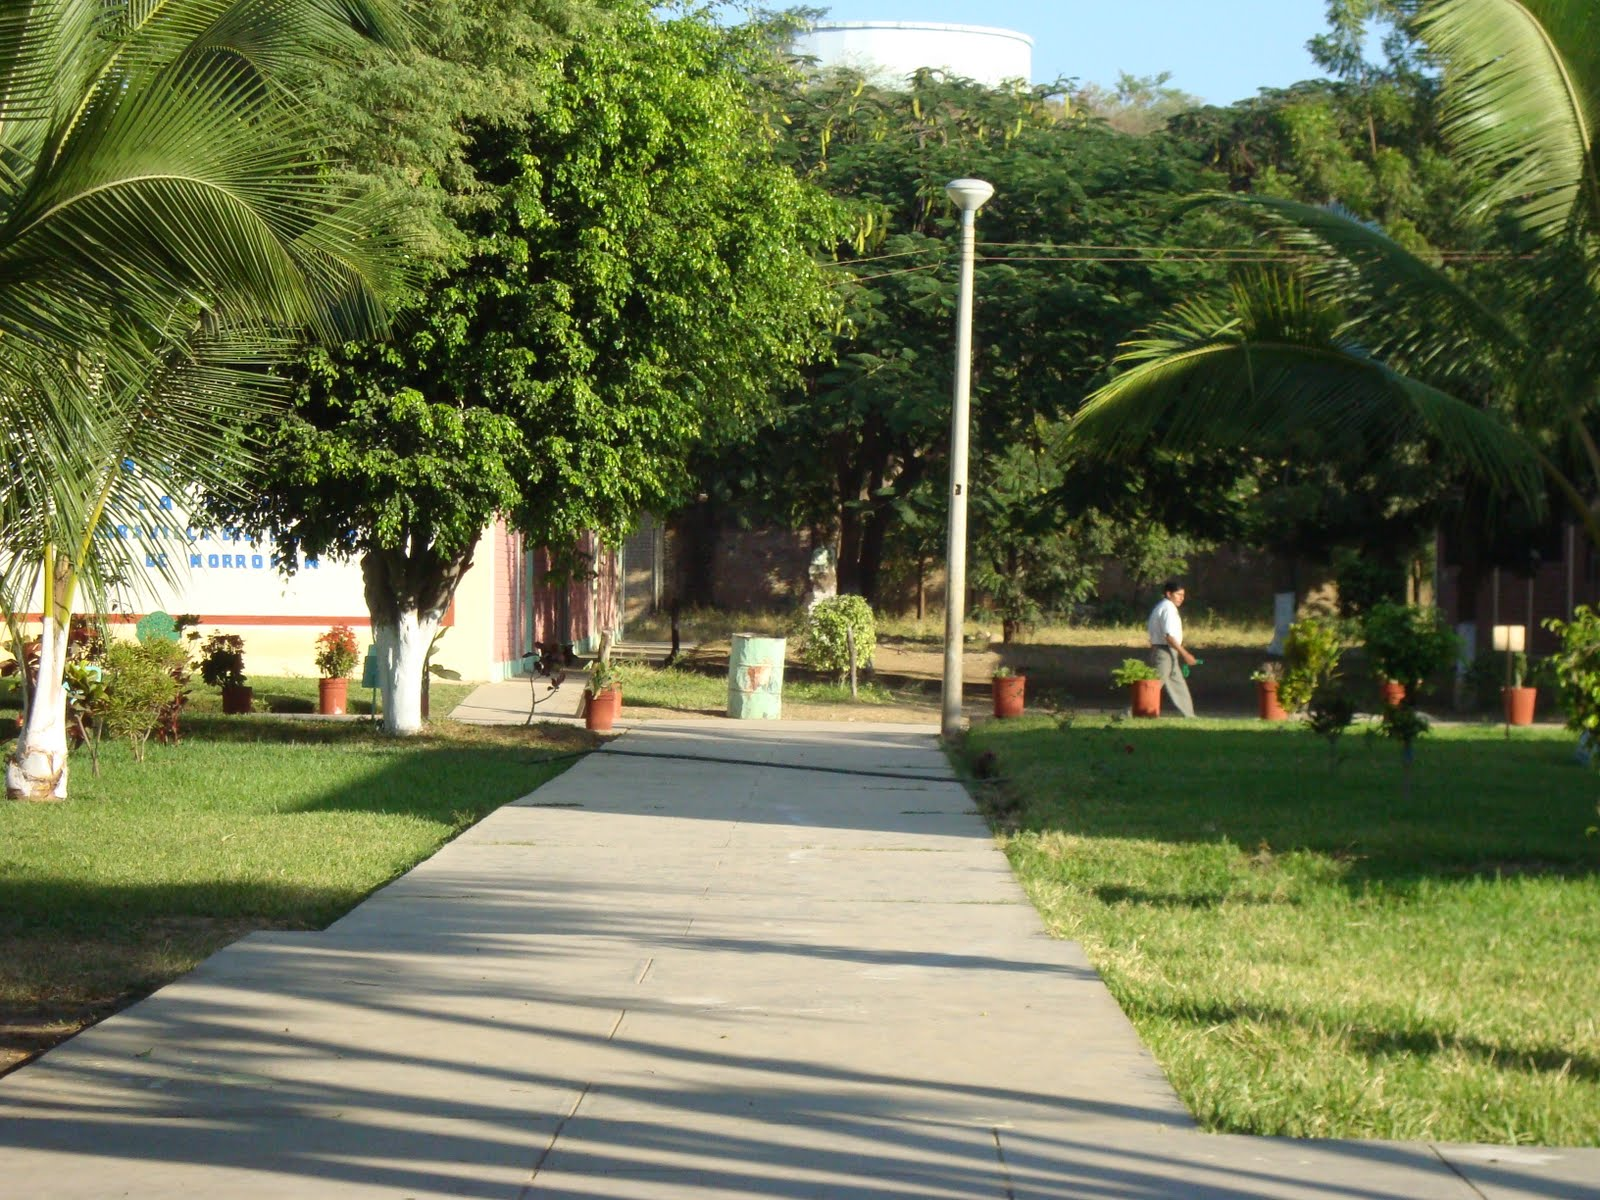 Jardin ecologico amg for Alma de jardin pacheco